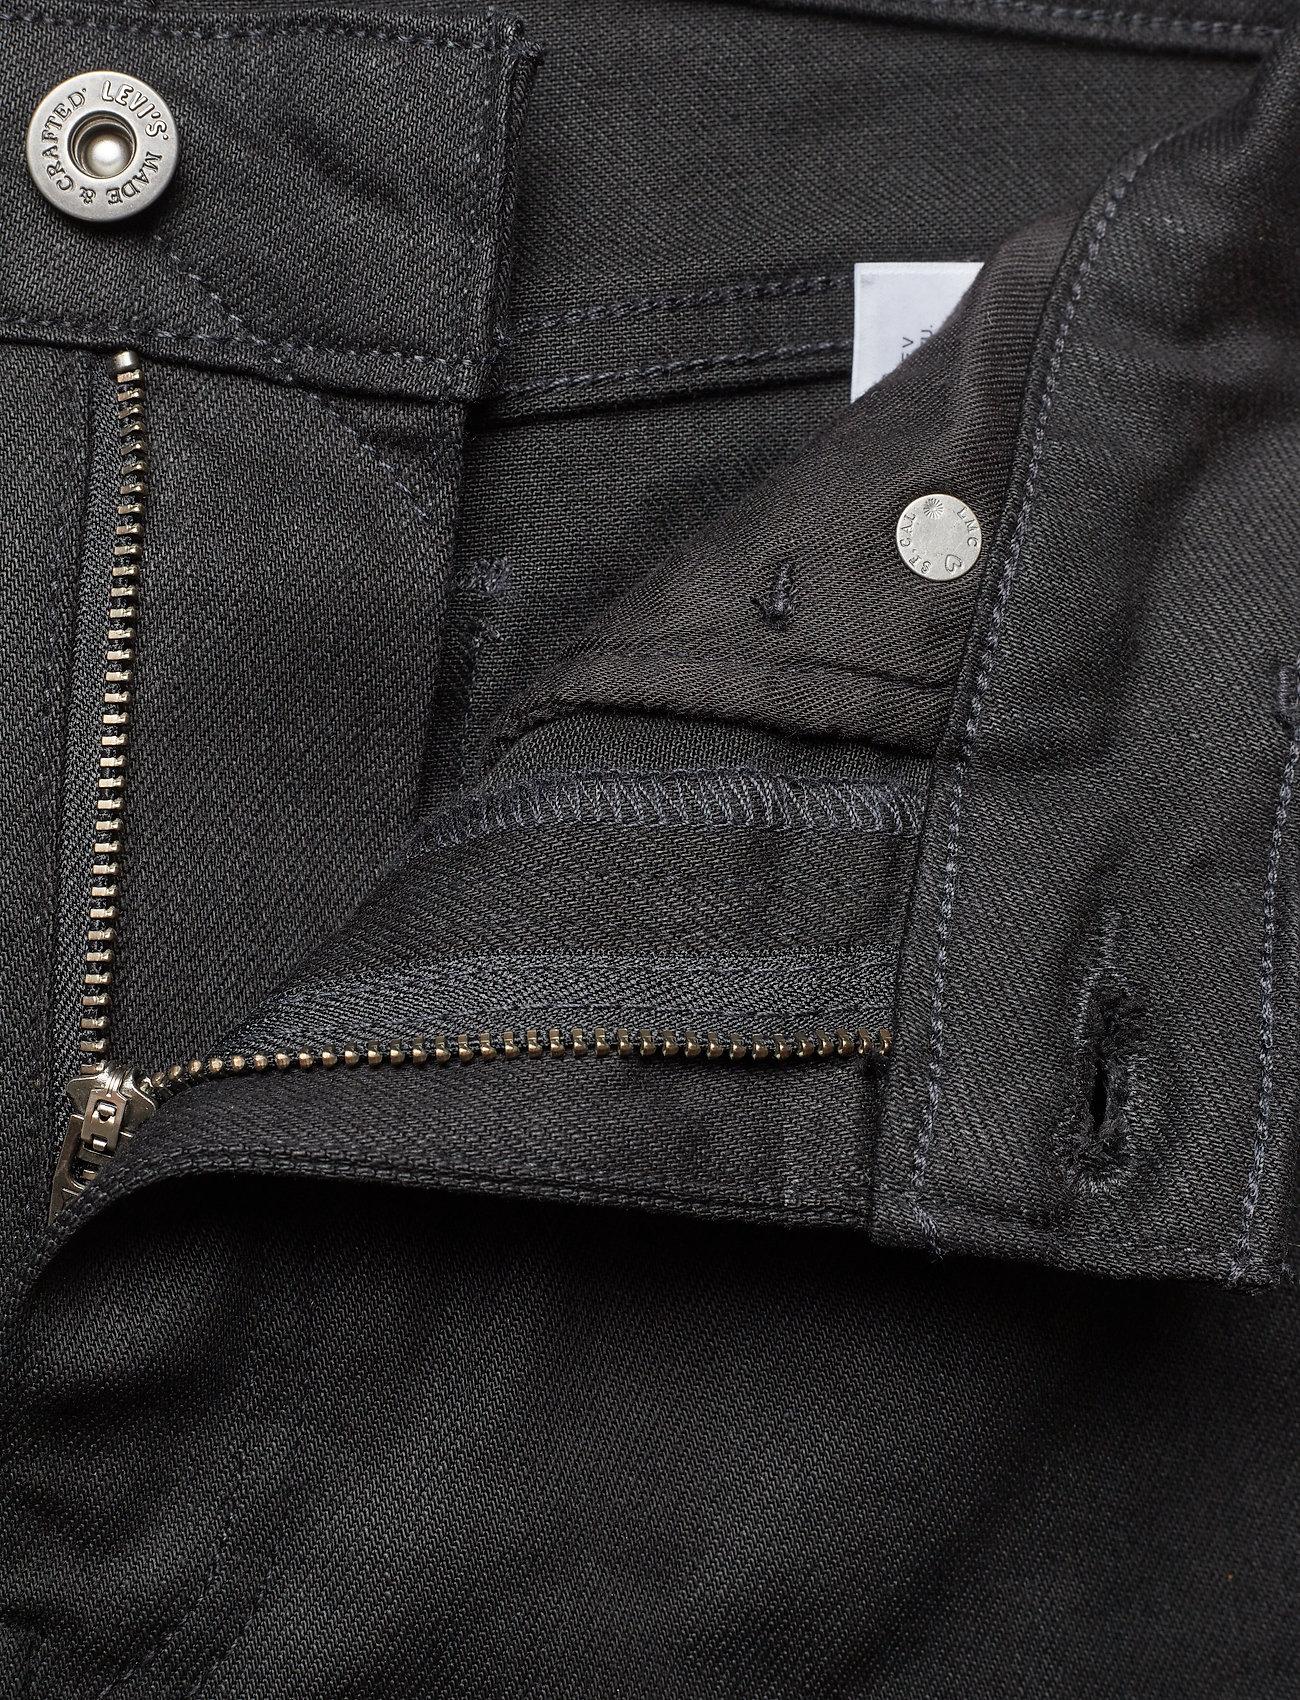 Levi's Made & Crafted - LMC 721 LMC STAY BLACK - skinny jeans - blacks - 3